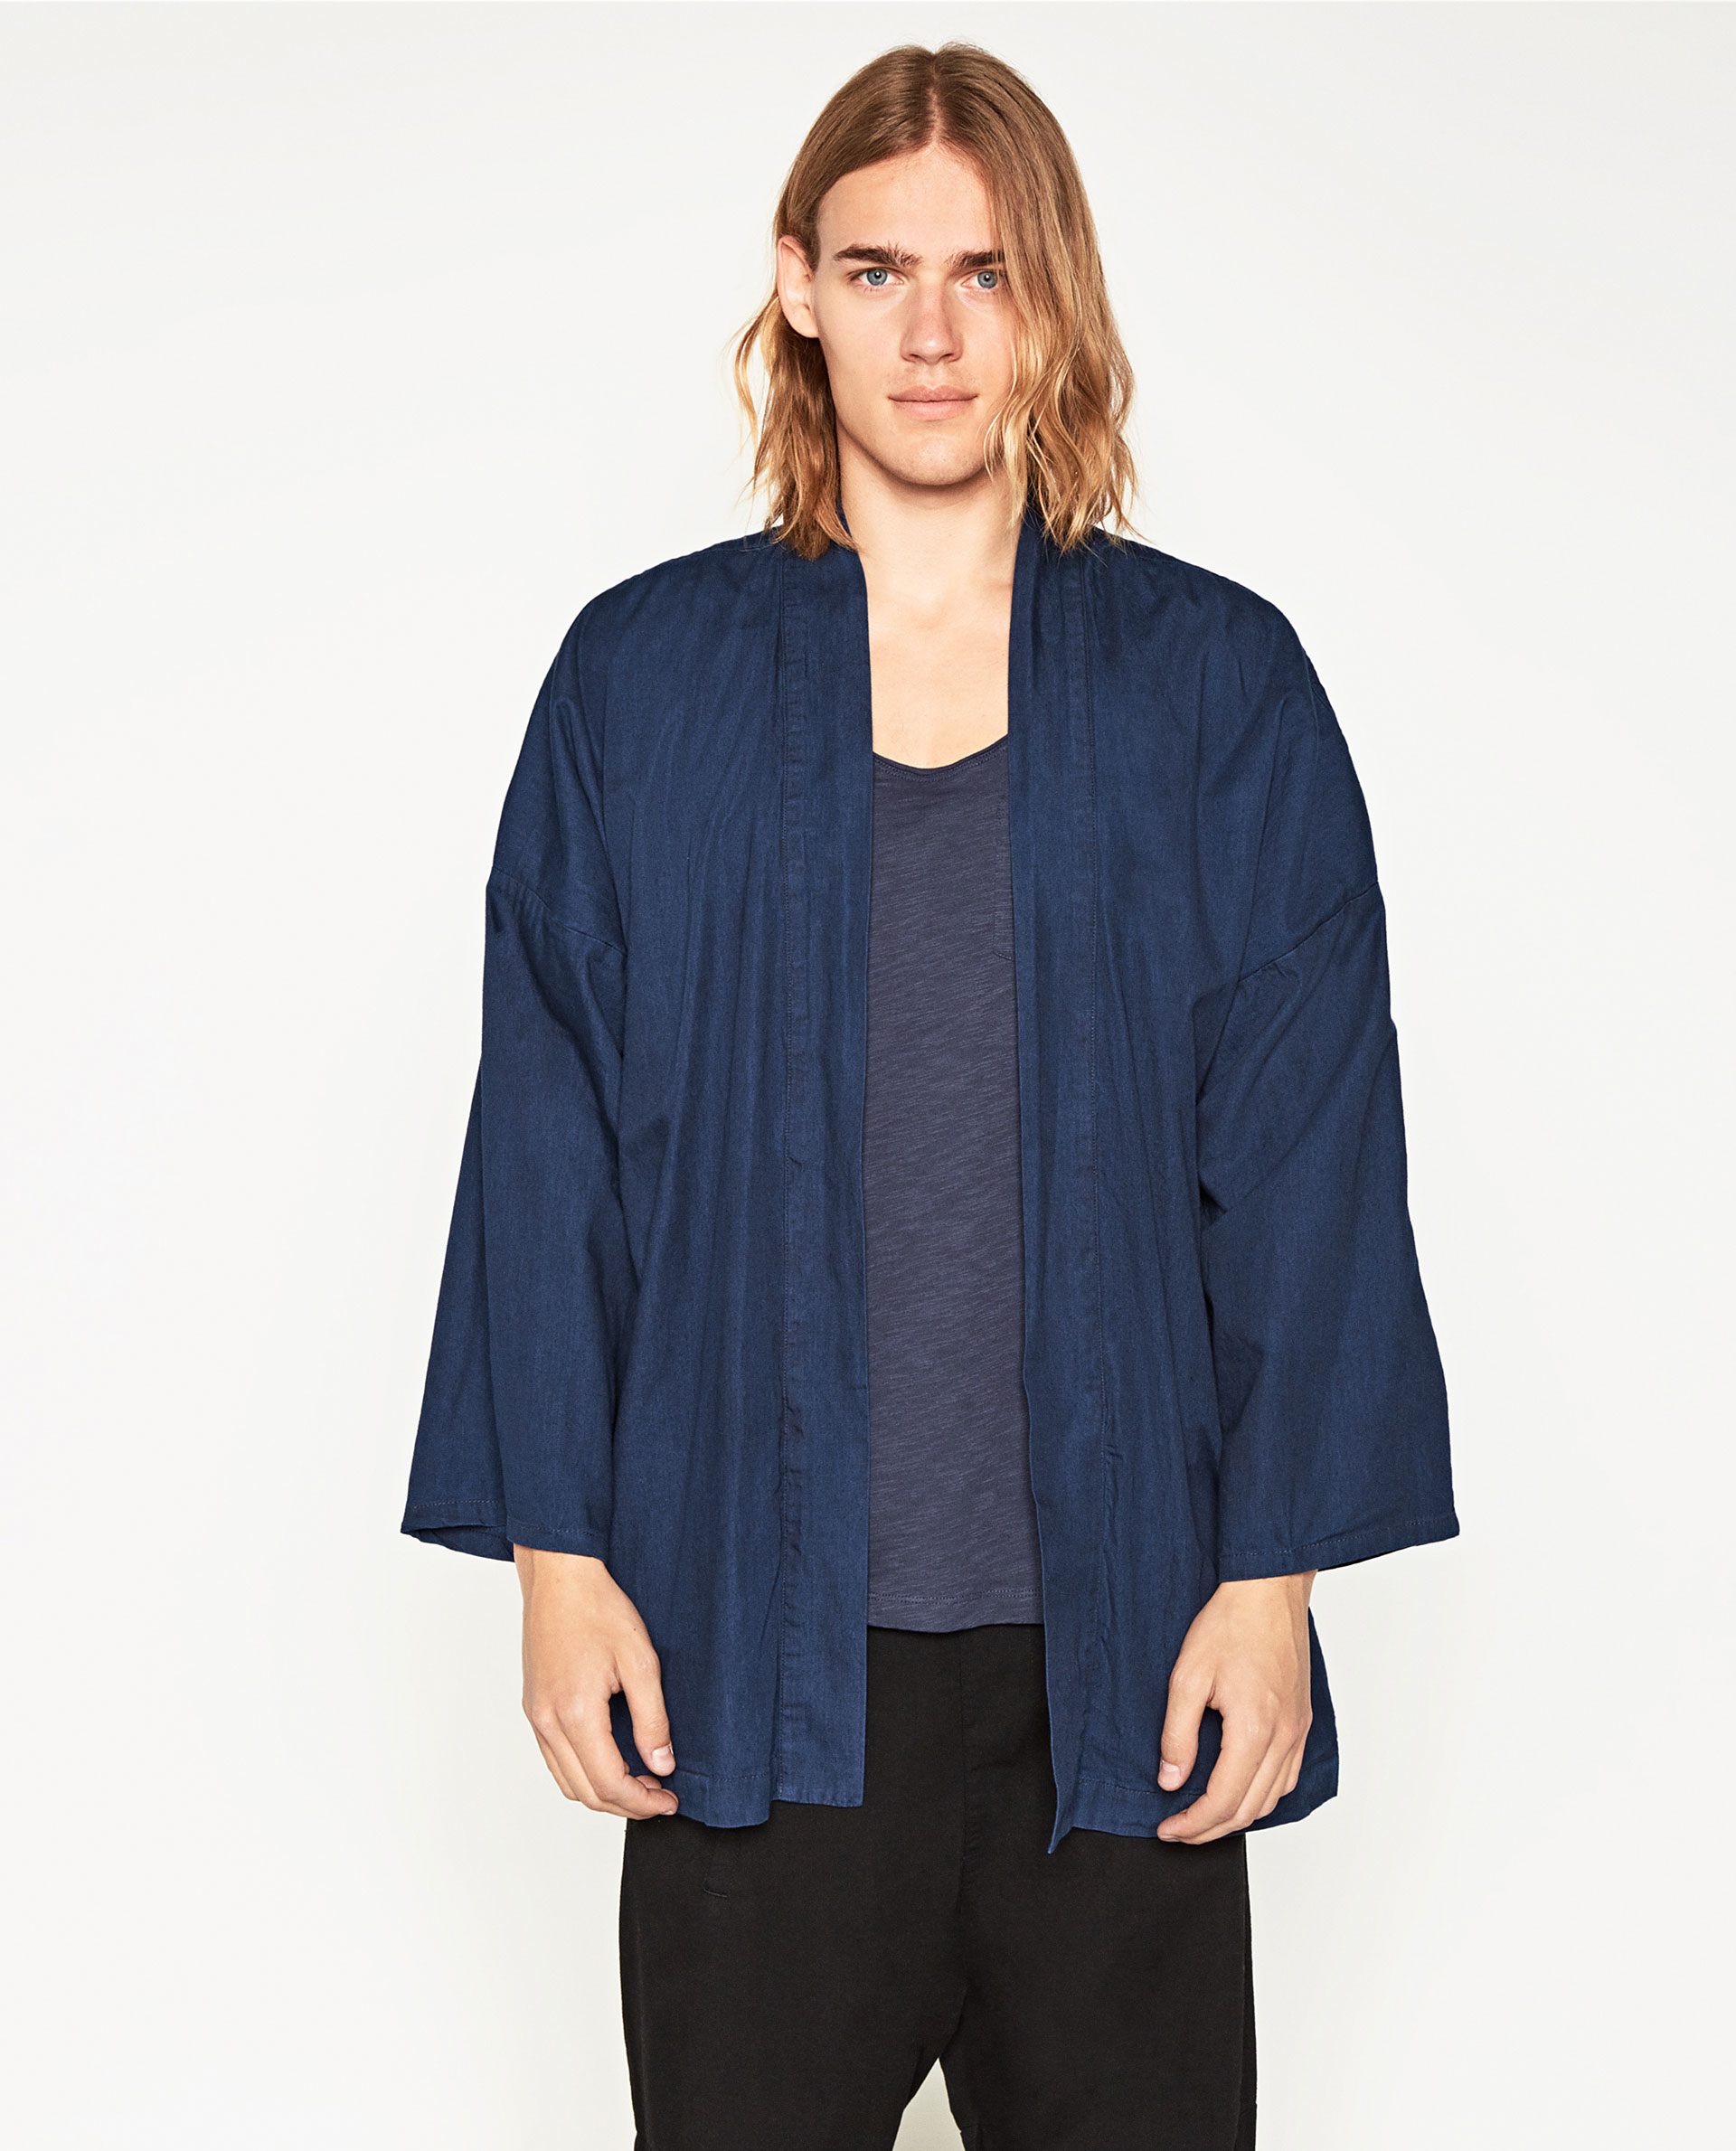 Moncler mens coats zara sale for sale moncleronline for Zara mens shirts sale